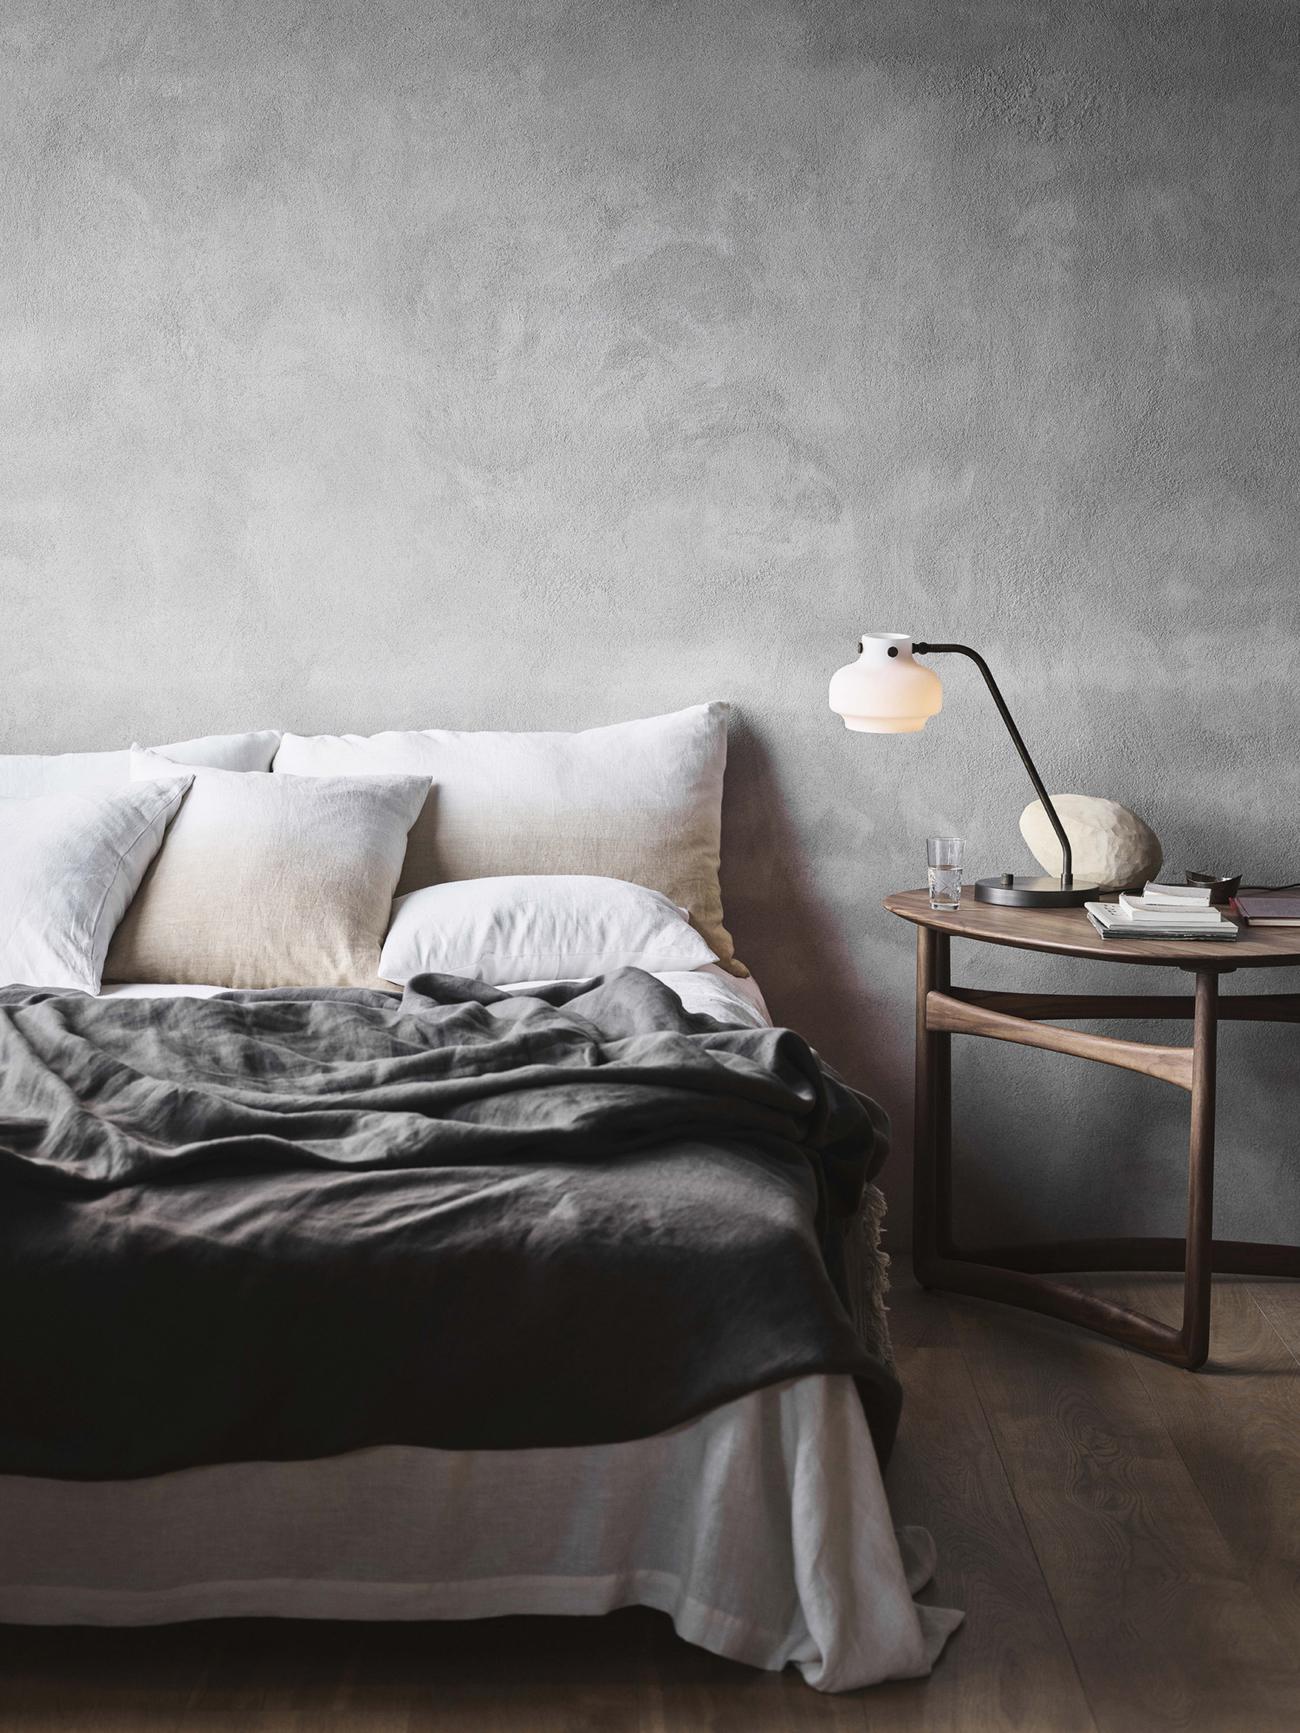 https://www.fundesign.nl/media/catalog/product/a/t/atd_lifestyle_2020_copenhagen_sc15_drop-leaf_hm5-tradition-collect-indigo-cushion-sc28-sc30-linen-cushion-sc27-sc28-bedspread-sc31-edit_web-1500x2000.jpg